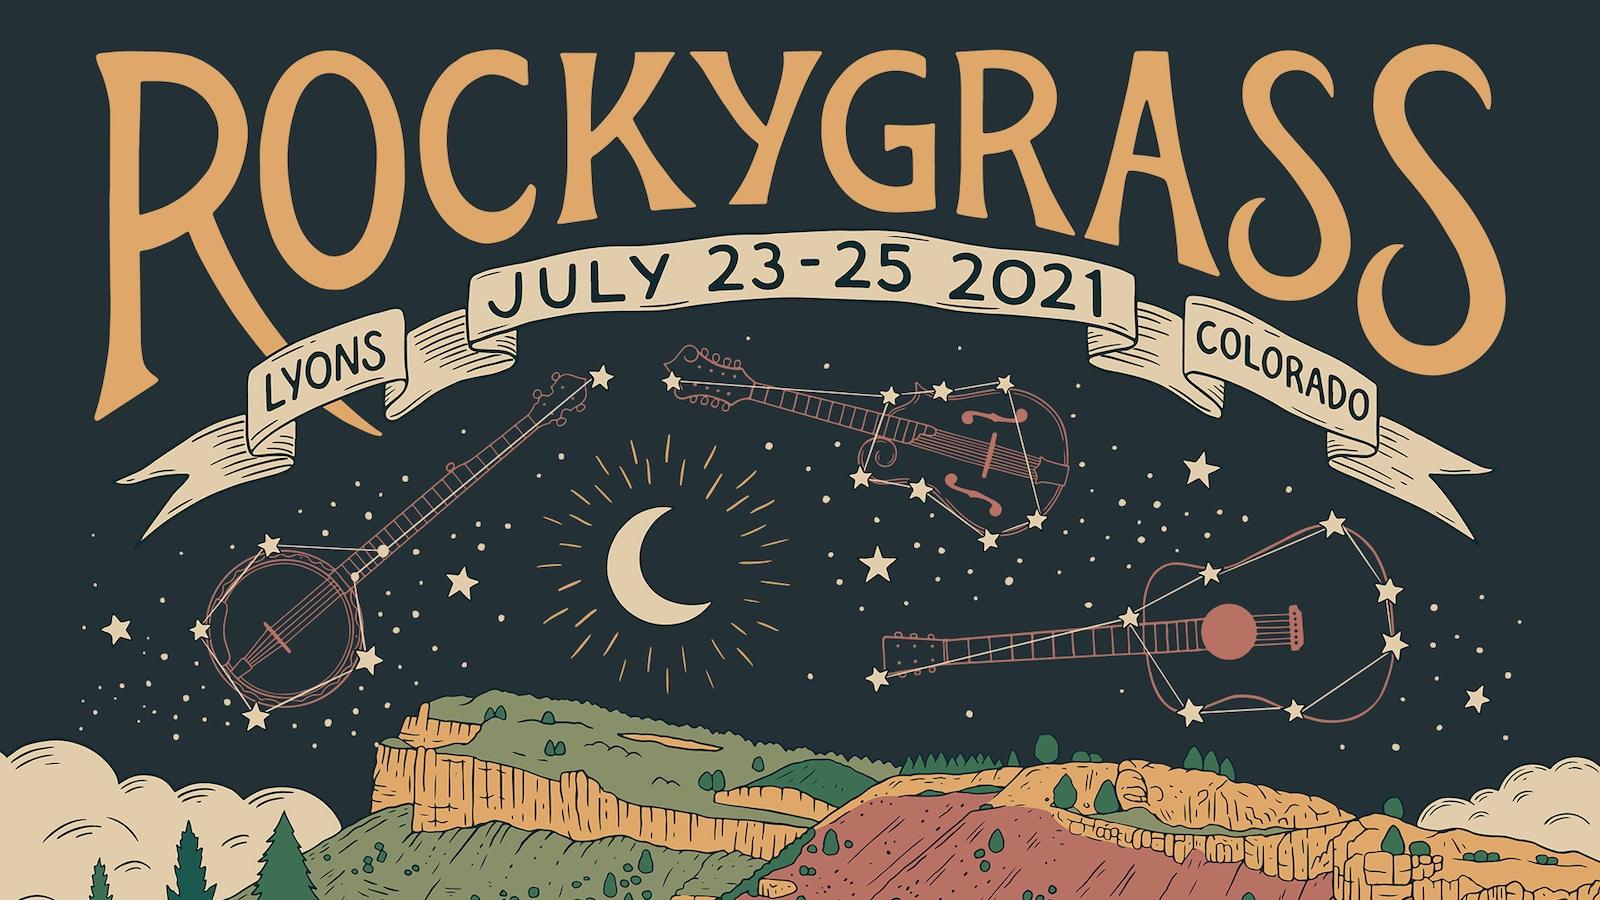 Rockygrass Festival Colorado